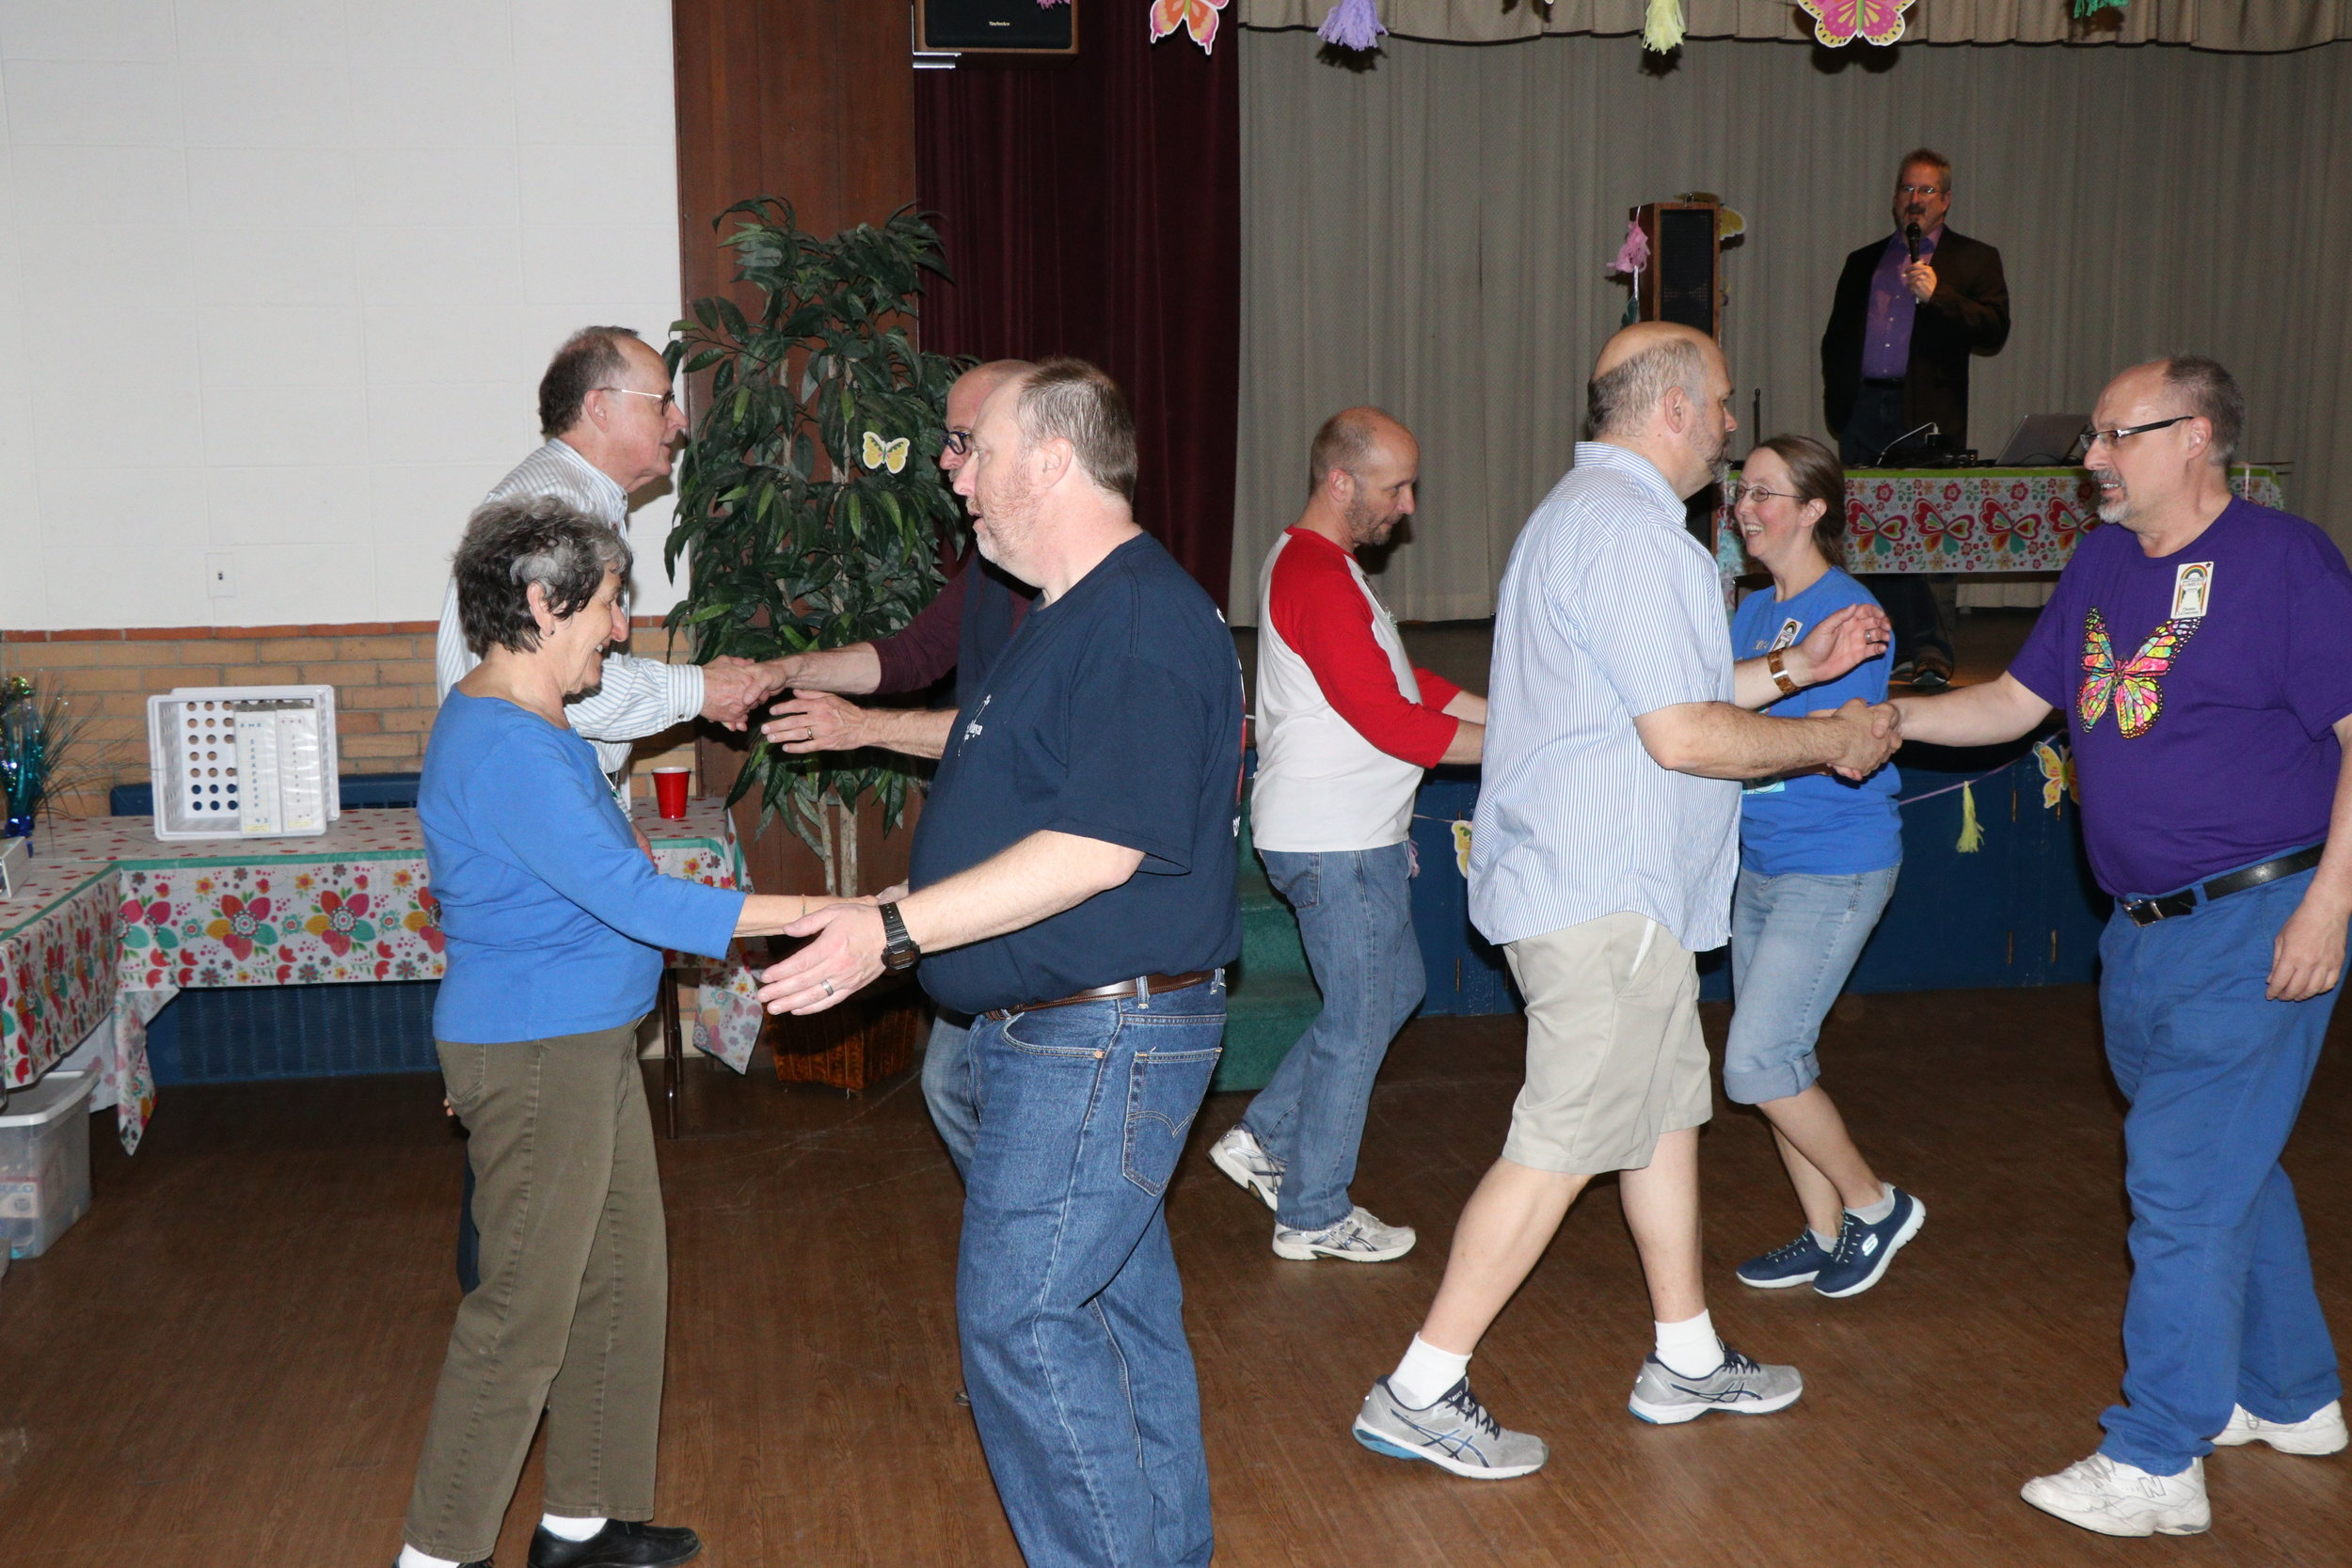 RMR 34th Anniversary Dance April 2018 - 12.JPG